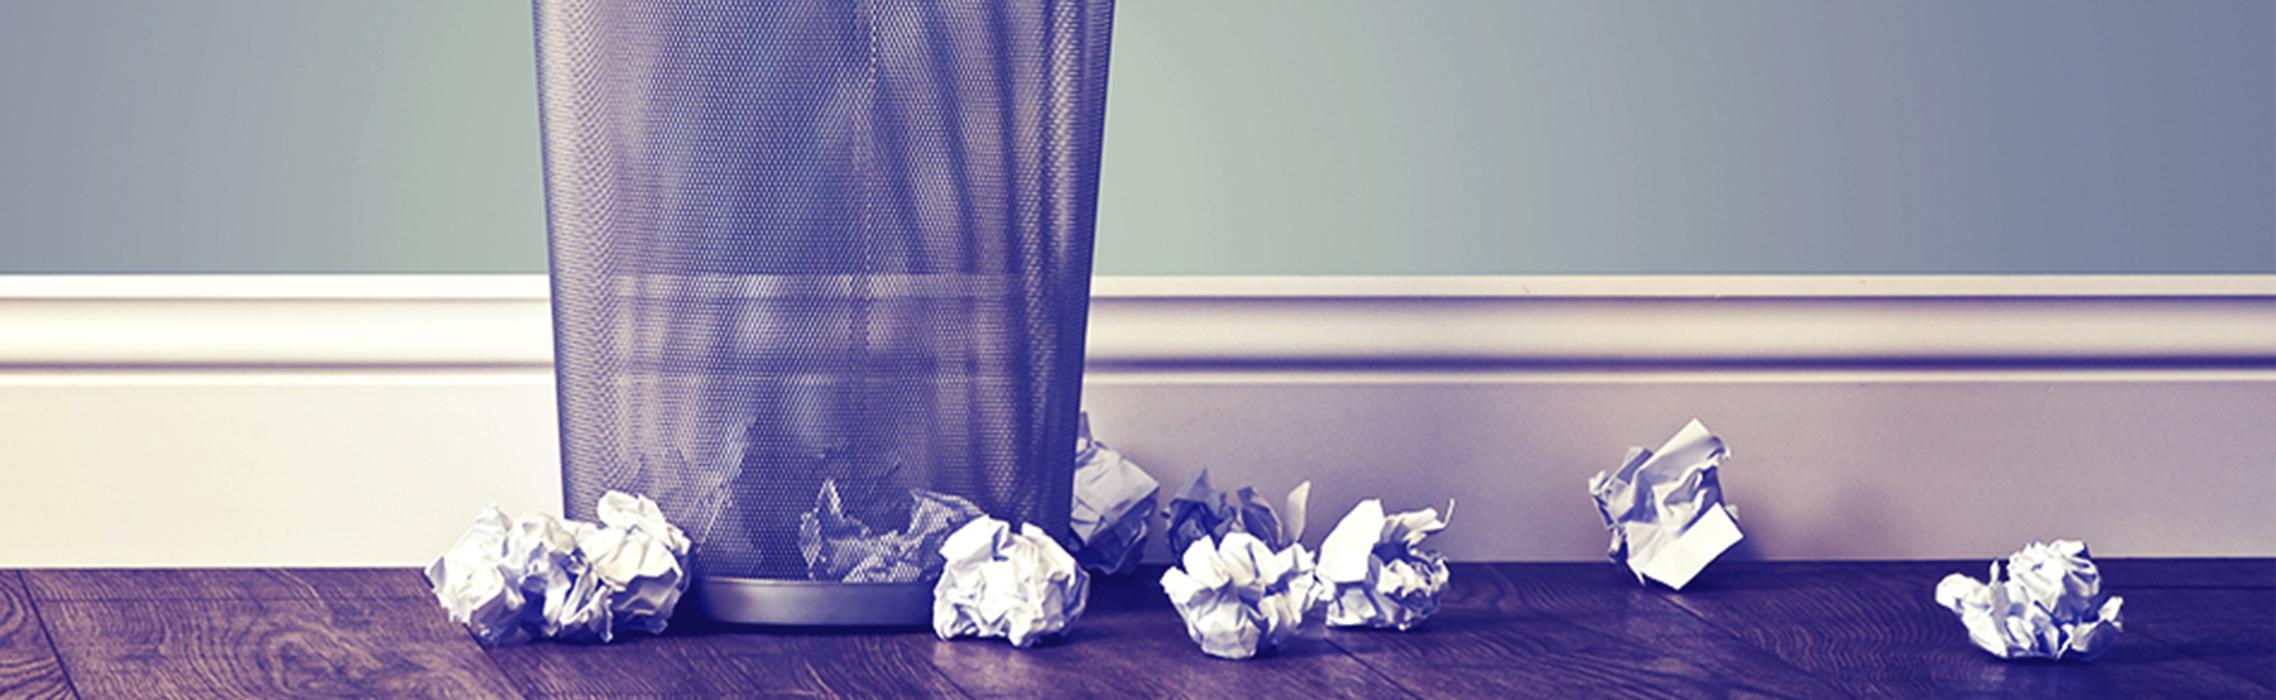 Common Mistakes Entrepreneurs Make When Starting A Business